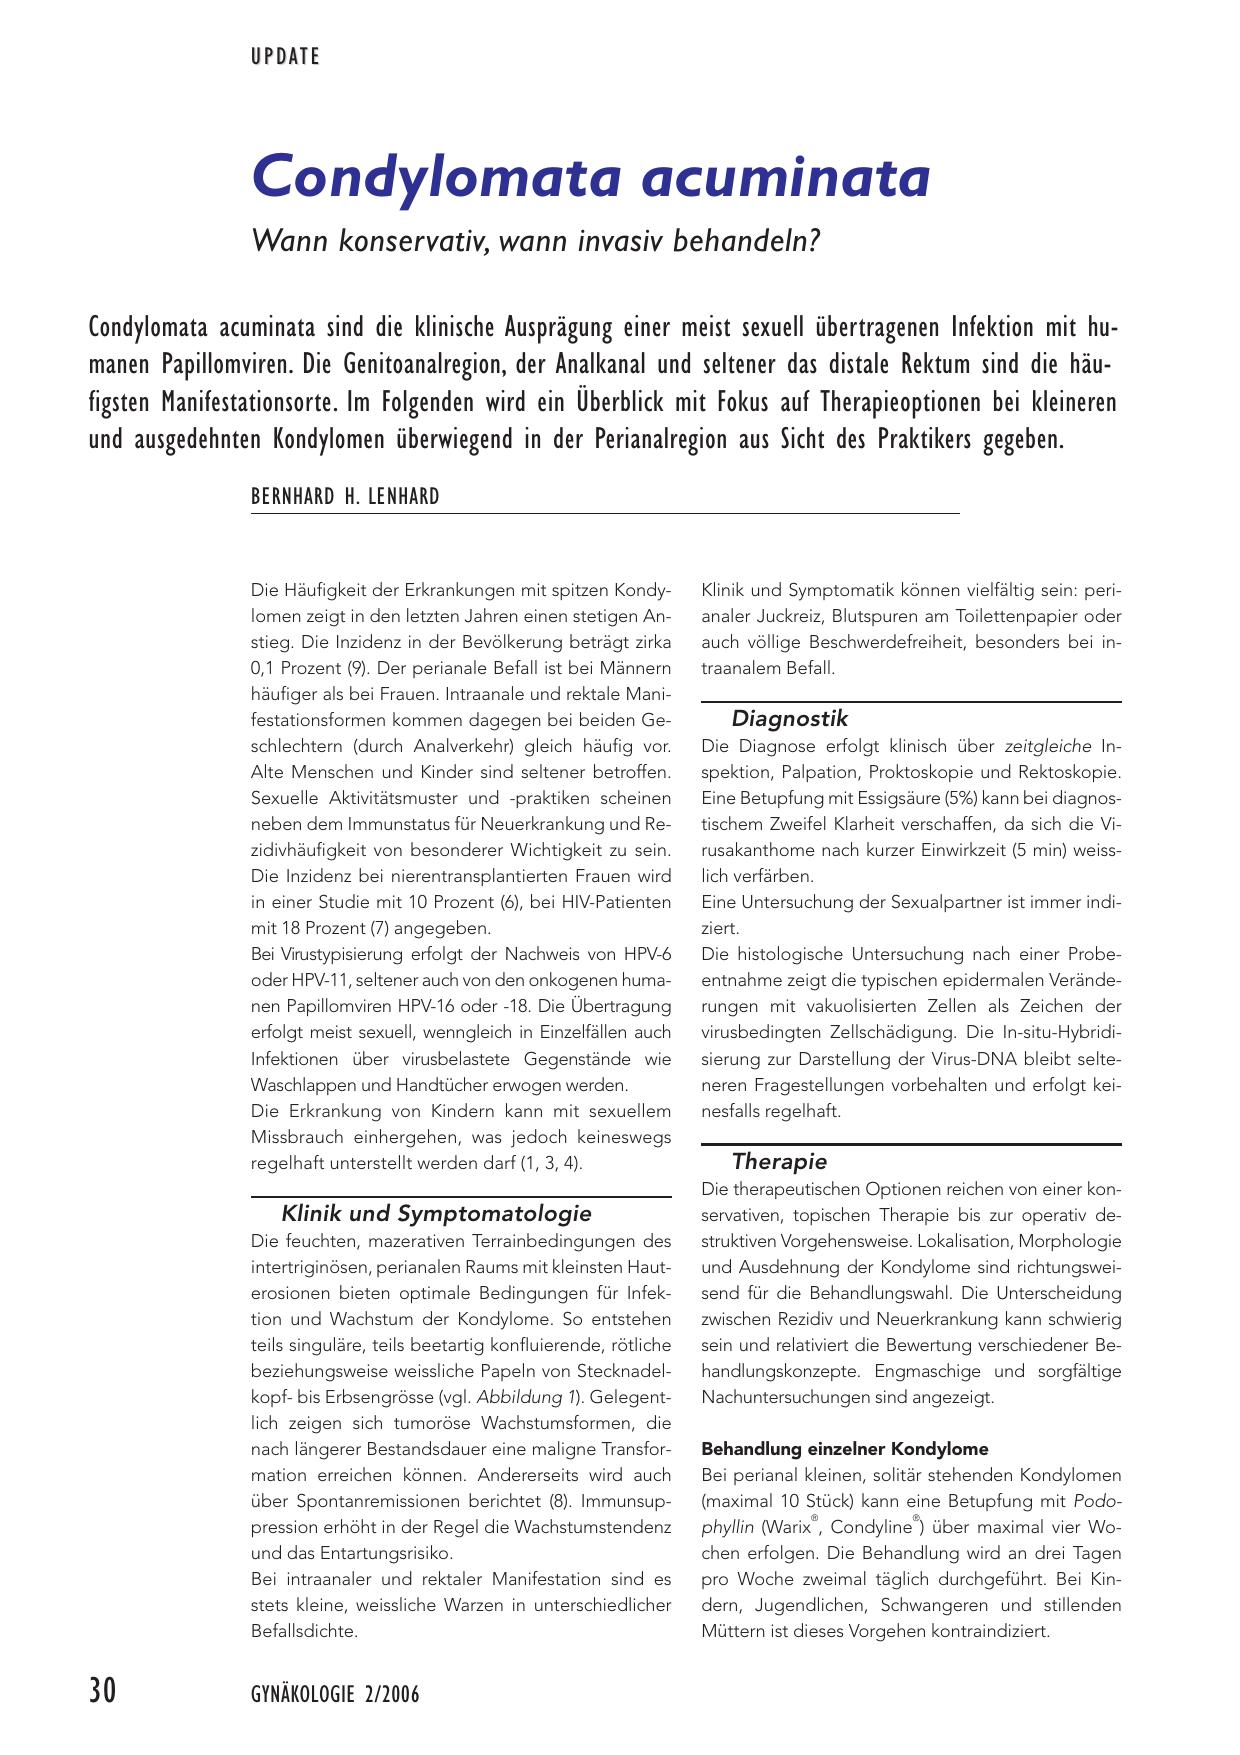 condylomata acuminata behandlung bei mannern respiratory papillomatosis medication